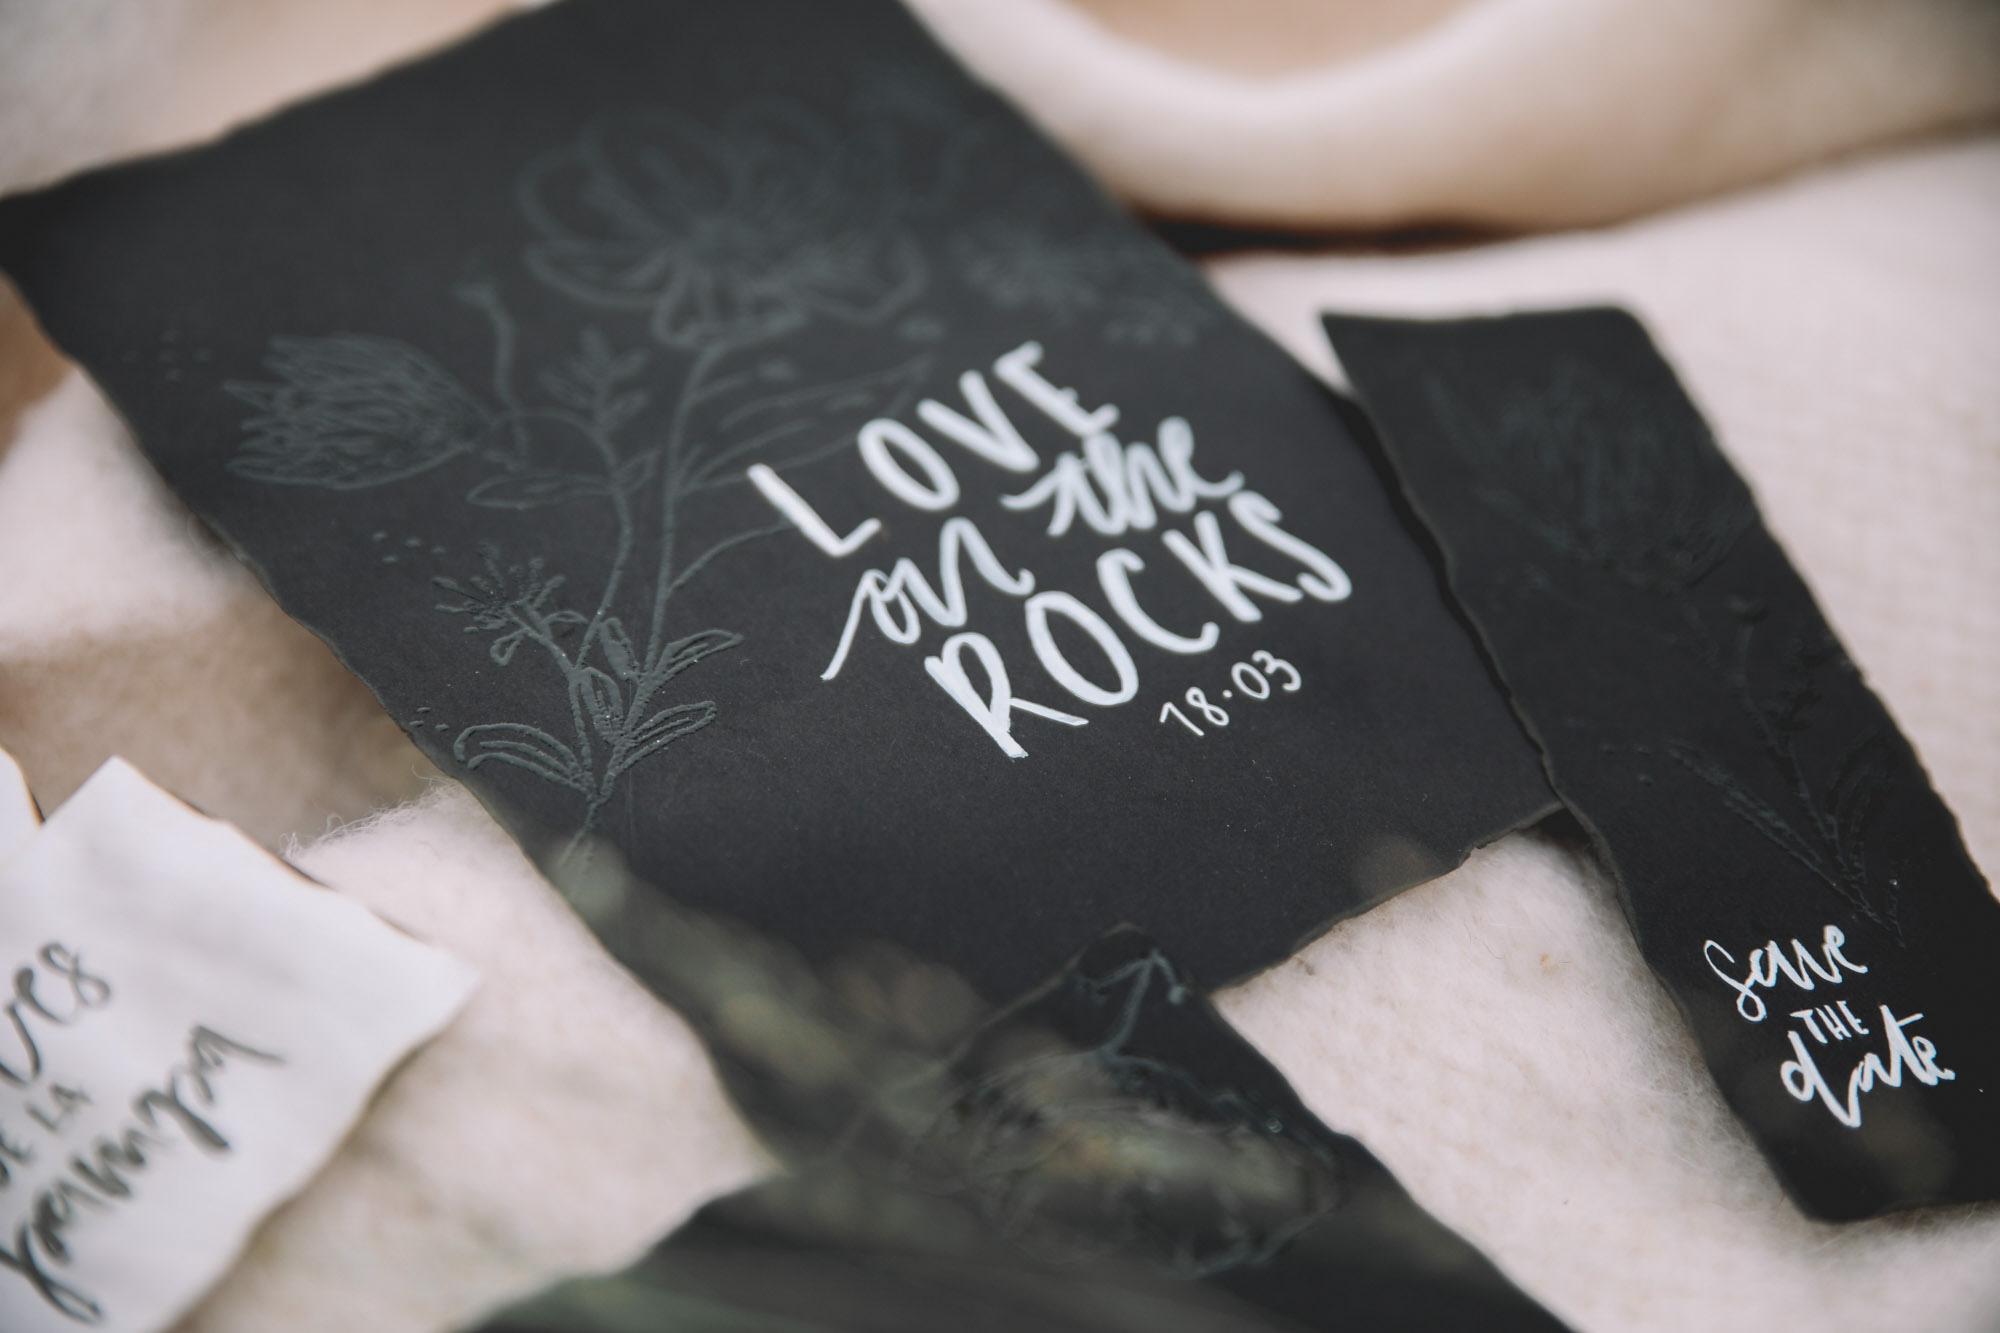 PAPETERIE_NOIRE_LOVE ON THE ROCK_PHOTOGRAPHE_MARIAGE_LES BANDITS-2